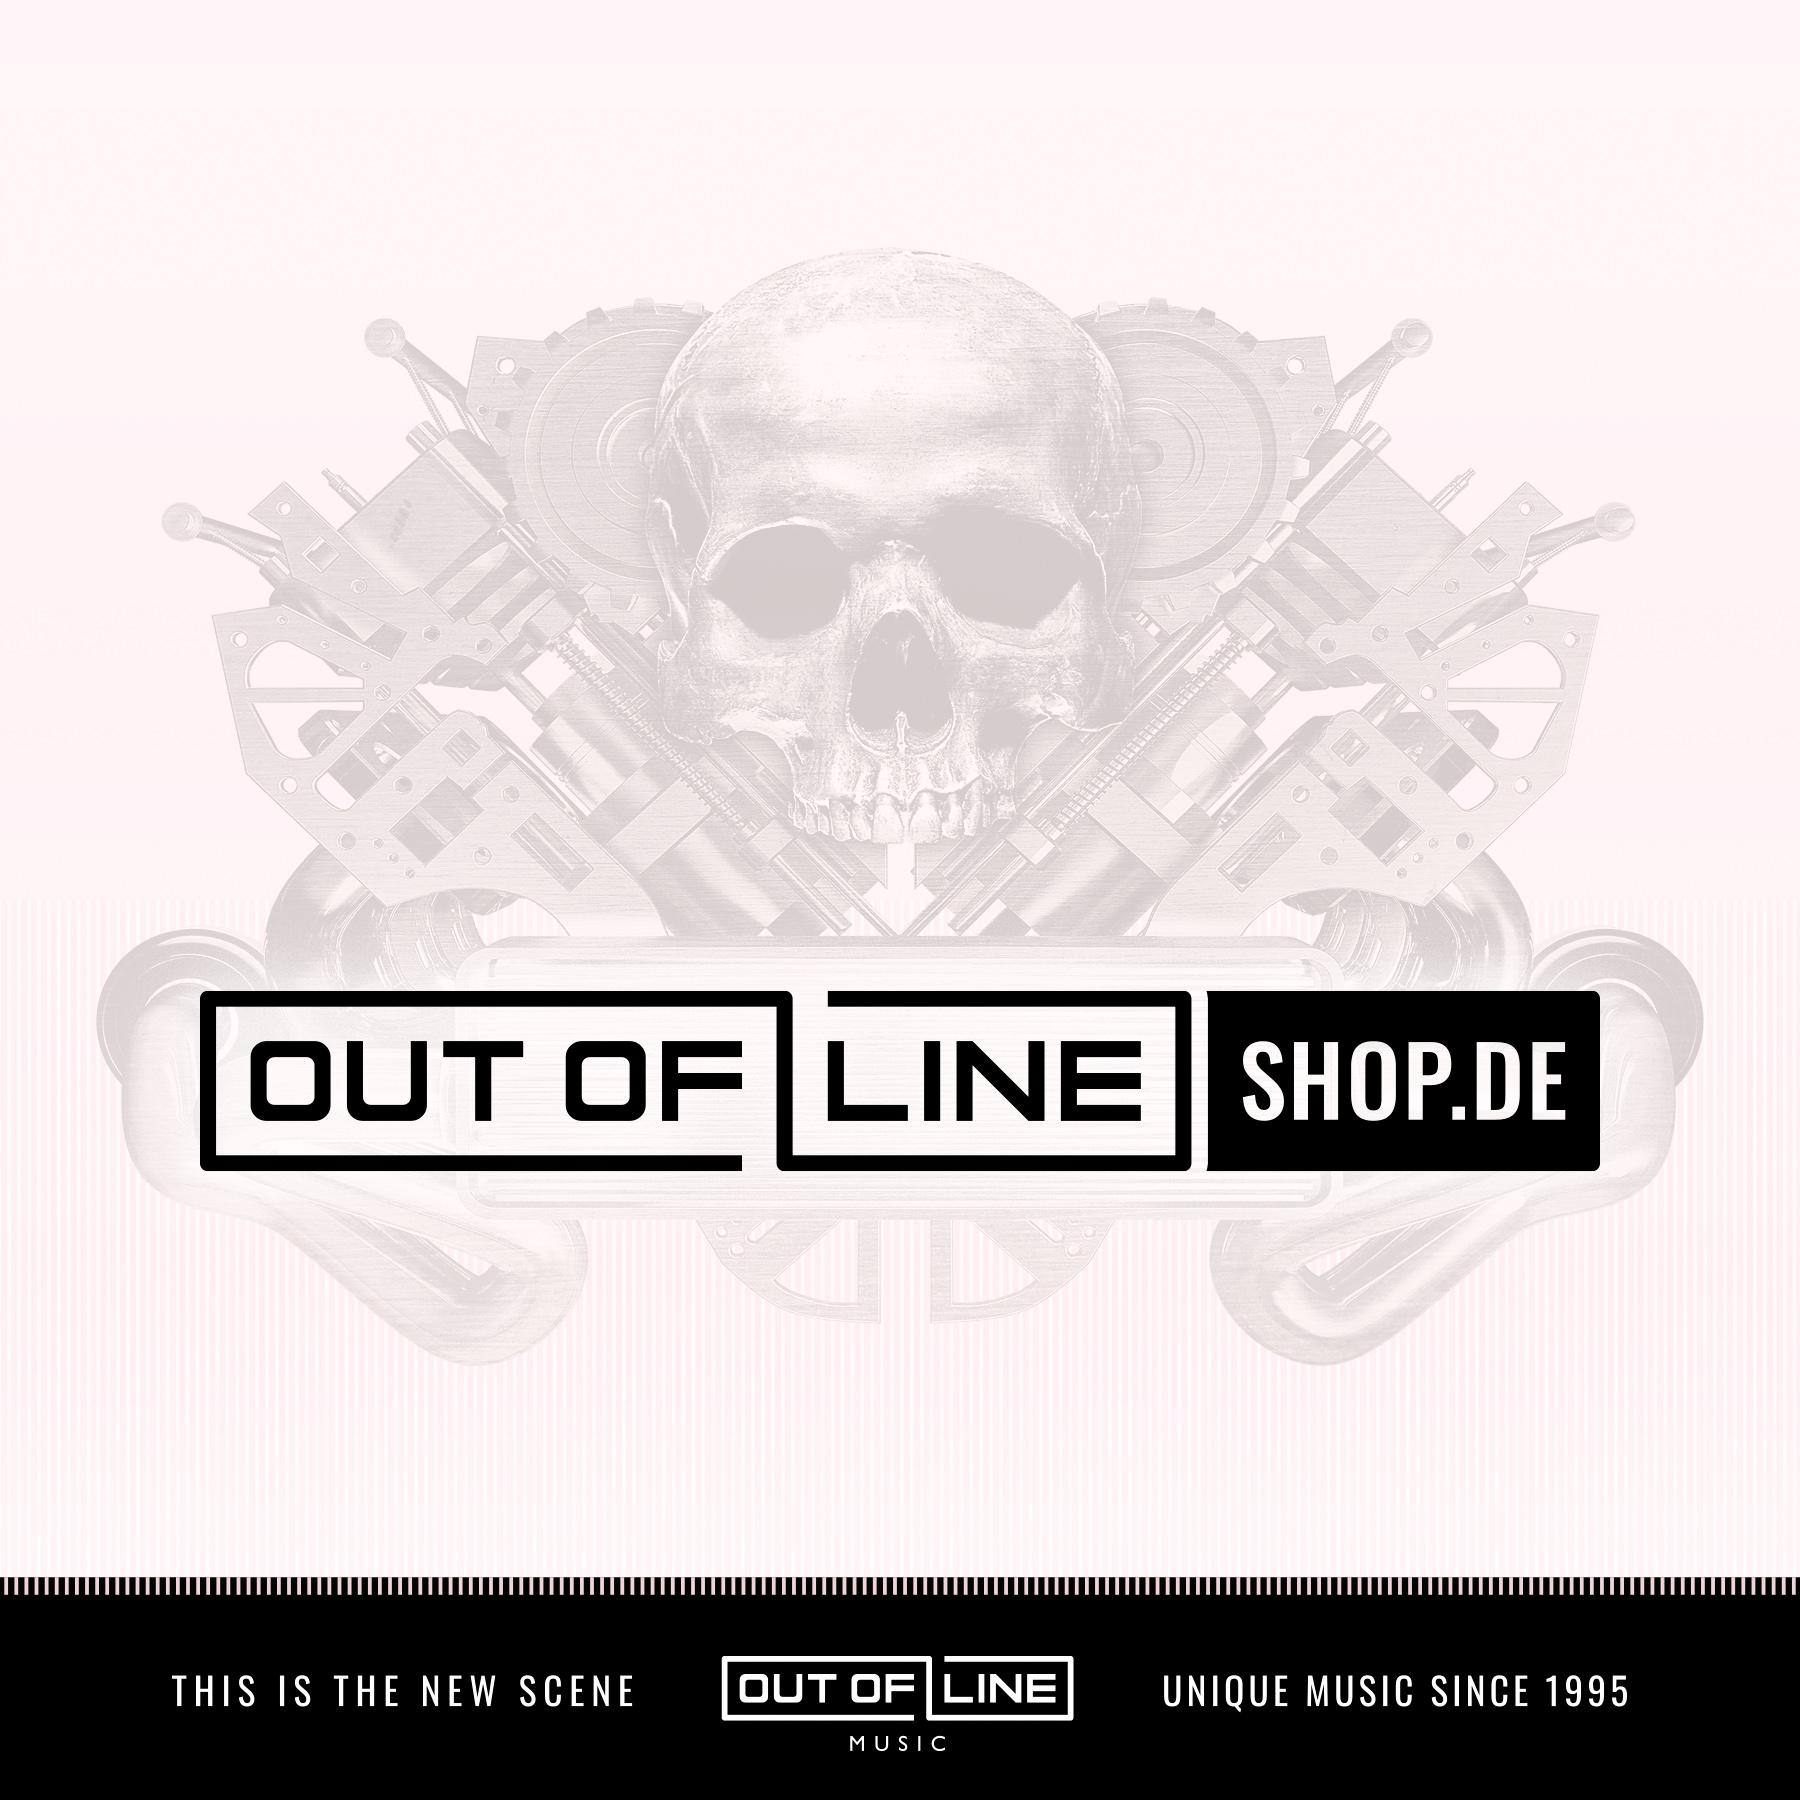 V.A. - Estigmas - DVD/CD - Limited Edition